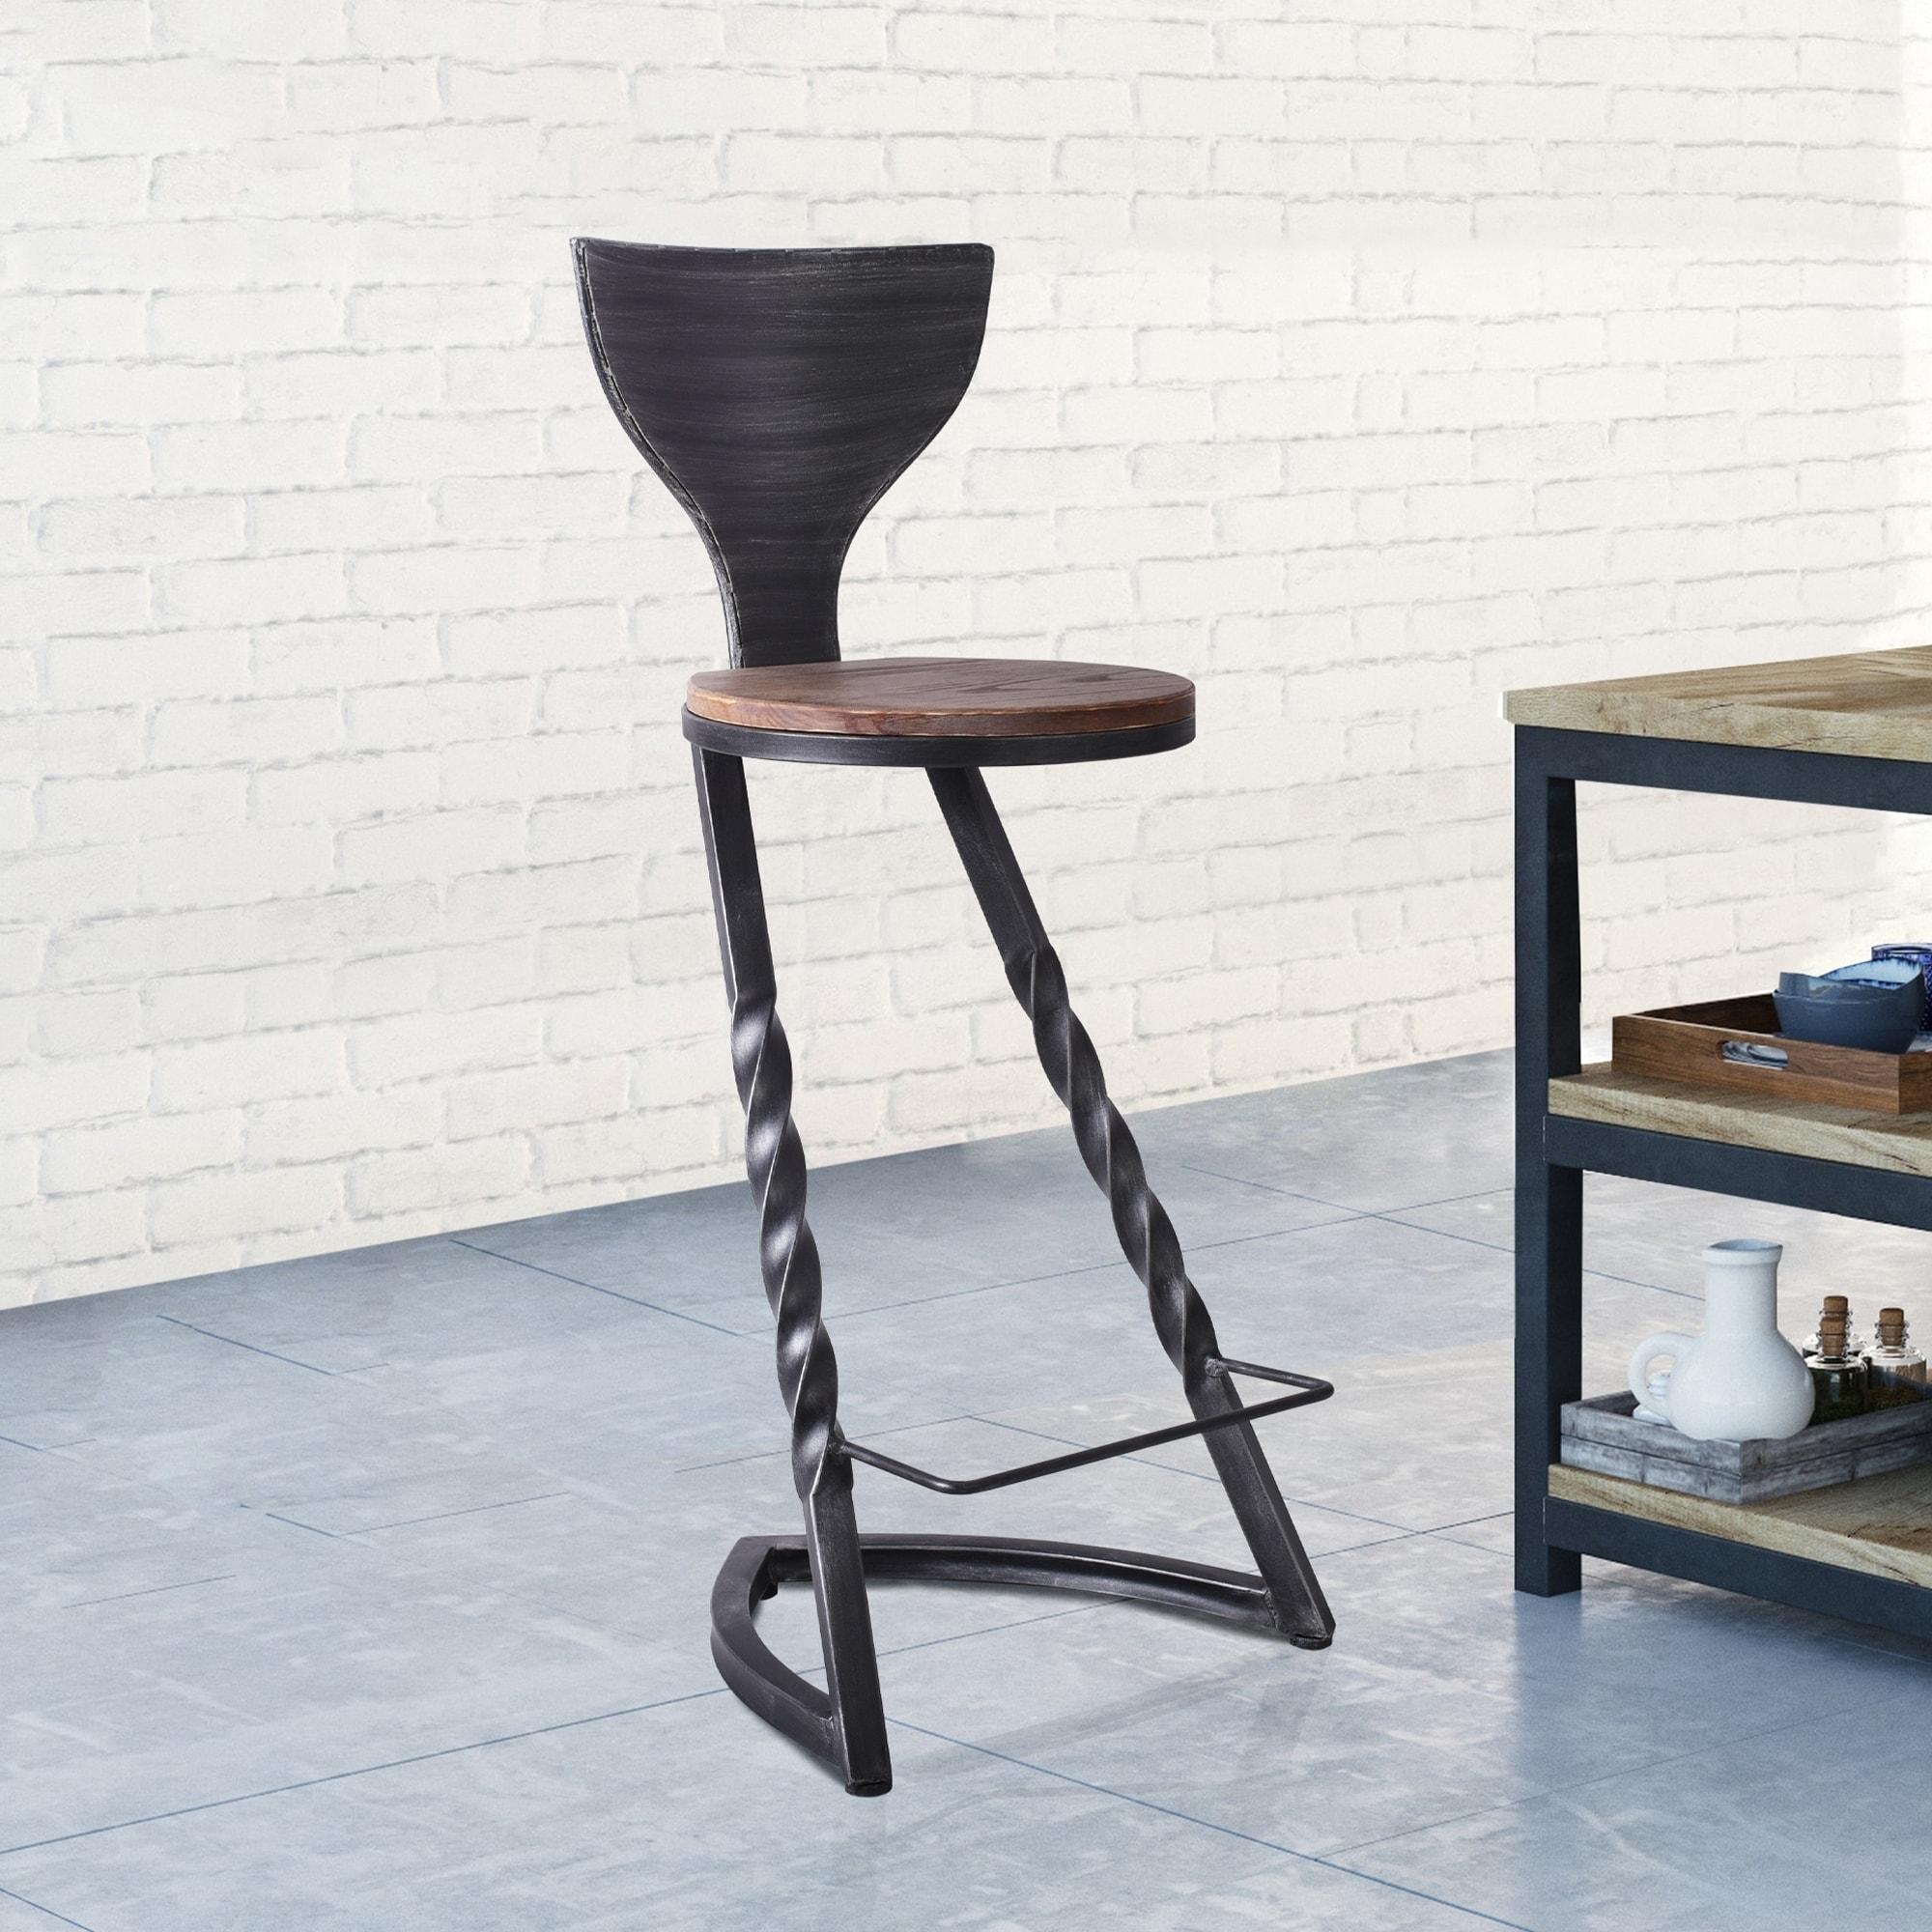 Prime Renens Industrial Metal Barstool In Silver Brushed Gray With Rustic Brown Wood Seat Inzonedesignstudio Interior Chair Design Inzonedesignstudiocom